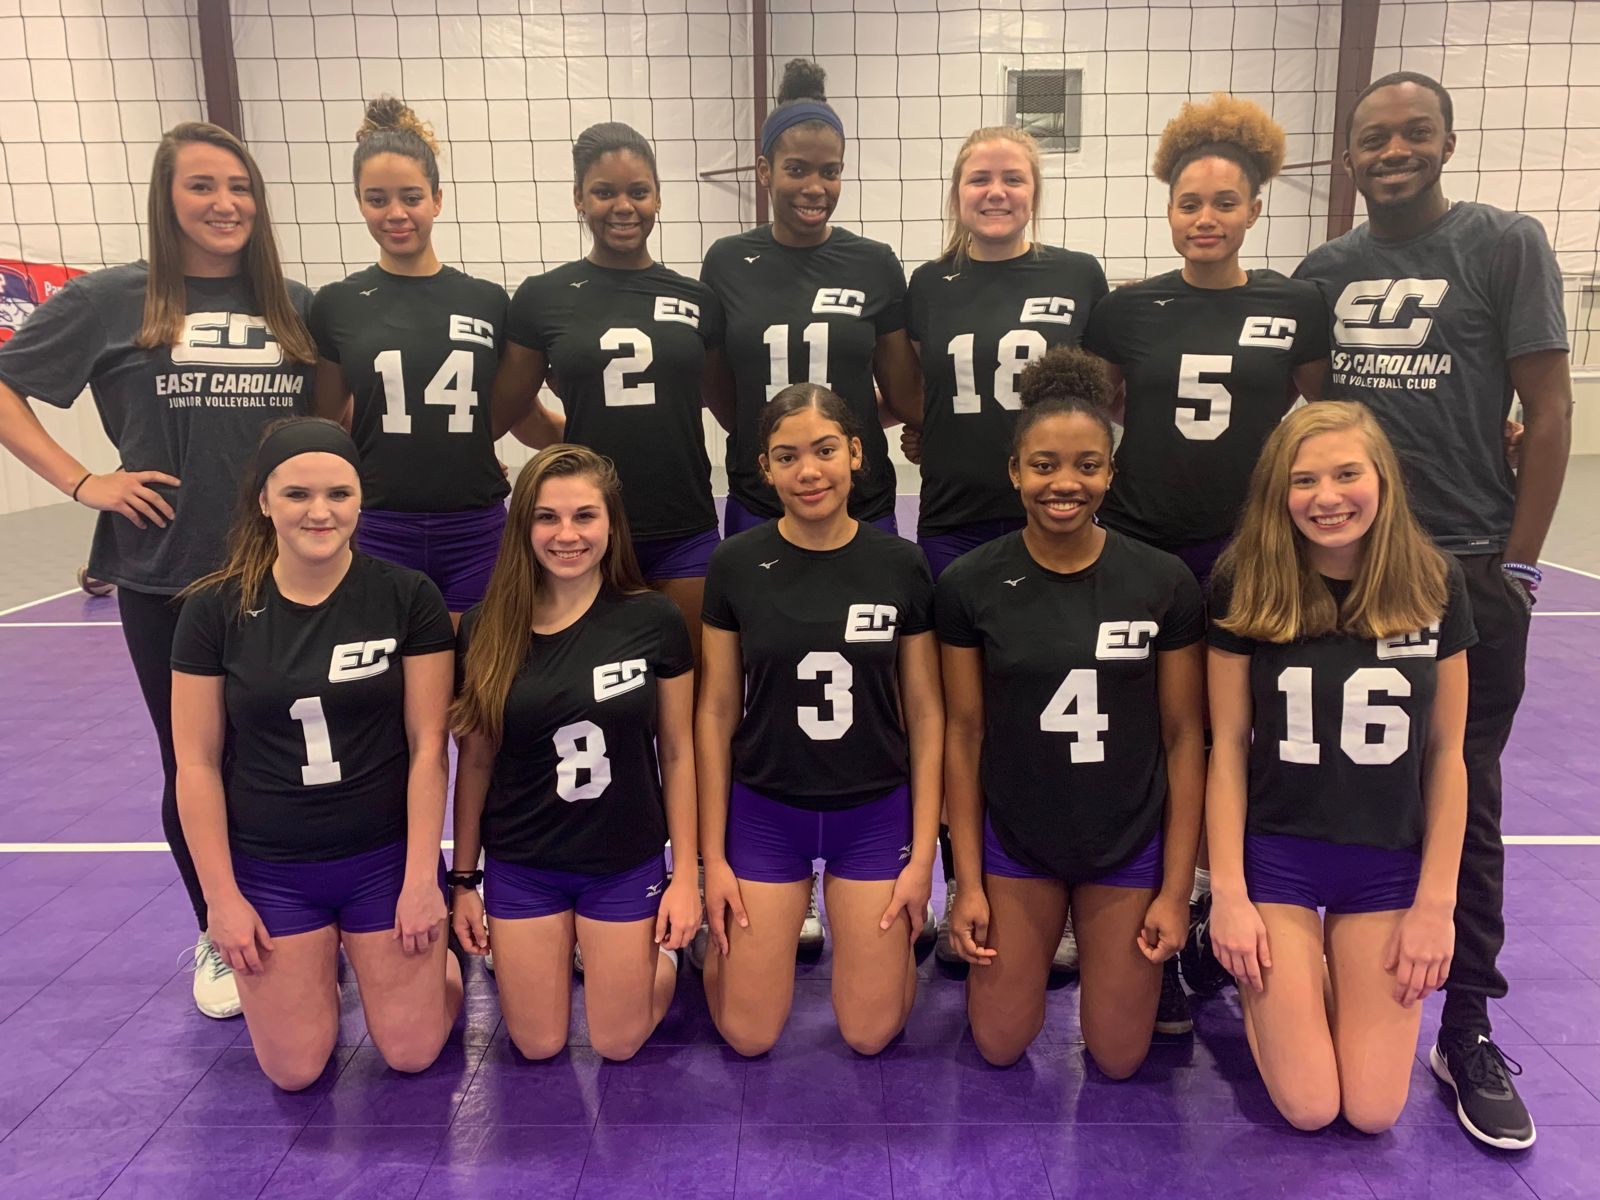 East Carolina Junior Volleyball Club - powered by Oasys Sports